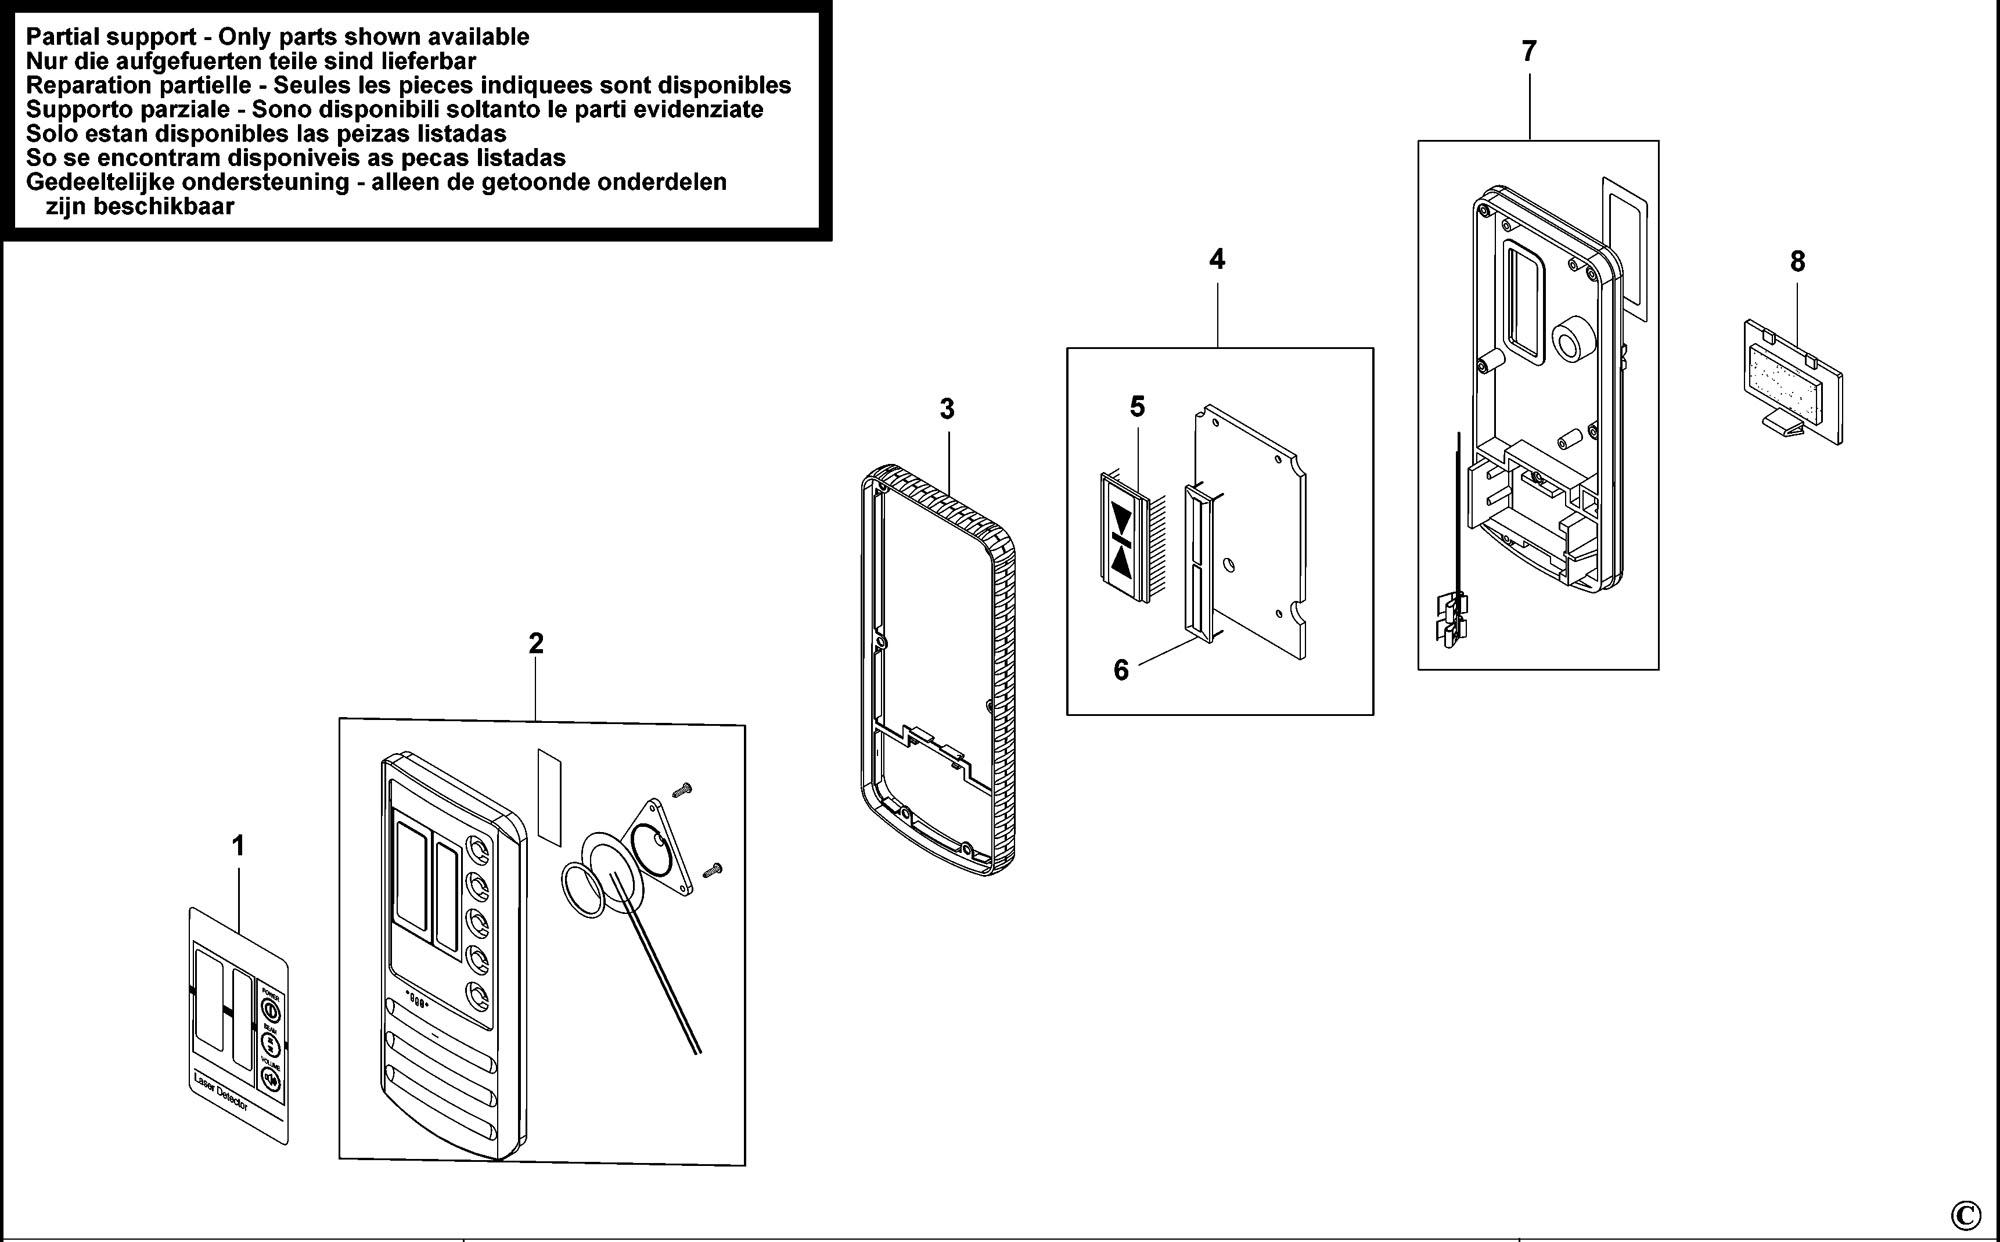 Spares for Stanley Lld1 Digital Laser Detector (type 1